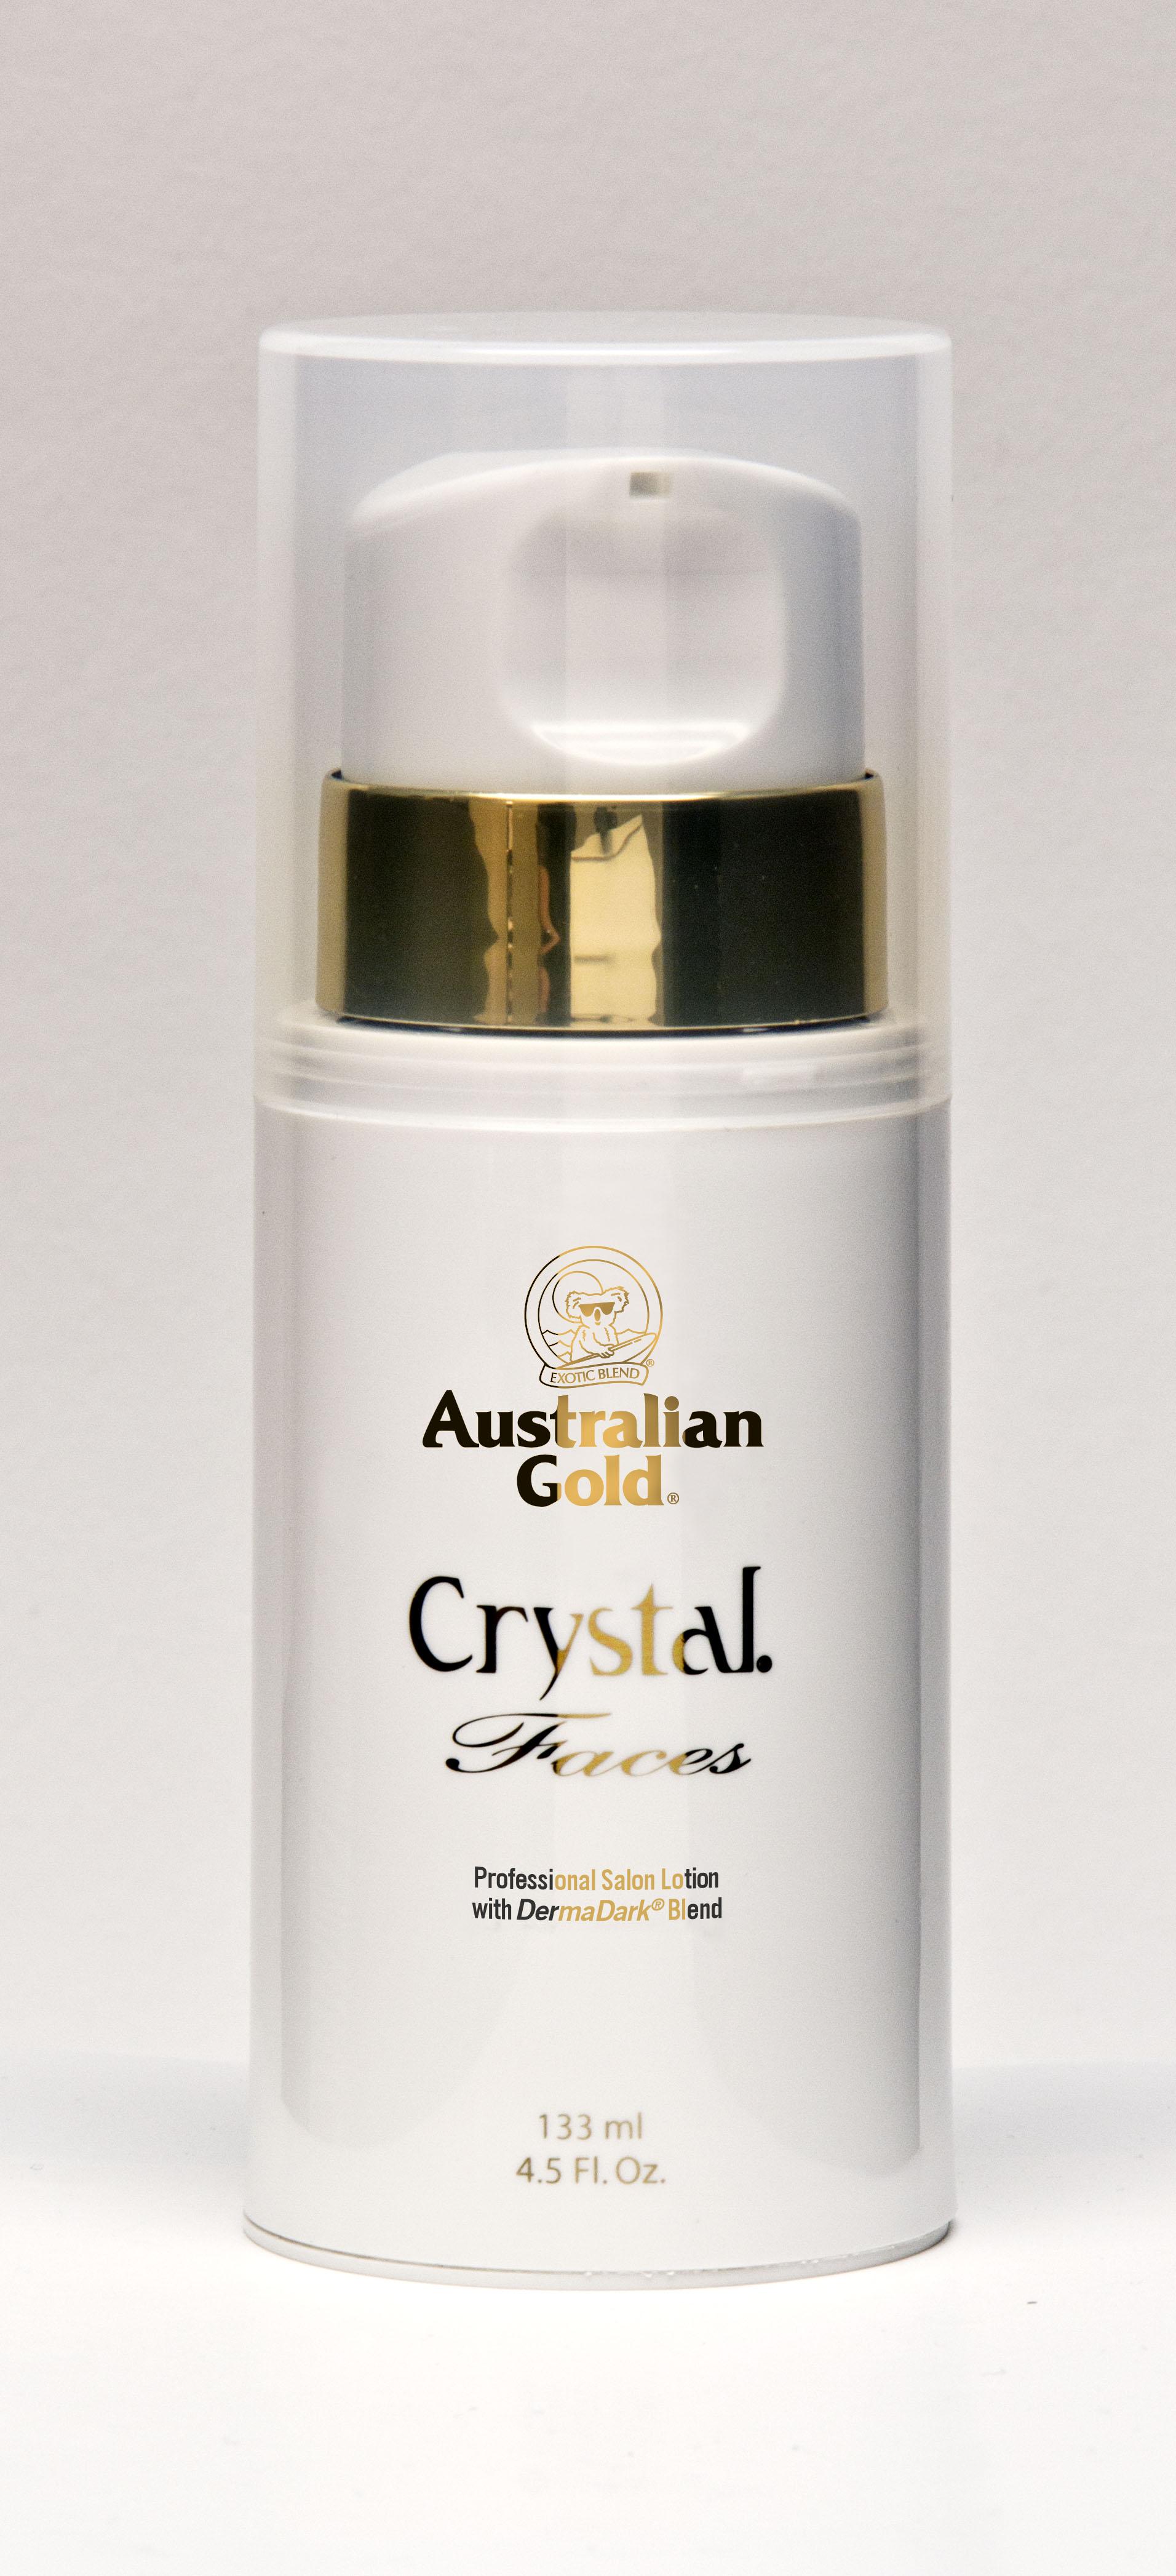 Crystal® Faces Intensifier with DermaDark® Bronzers